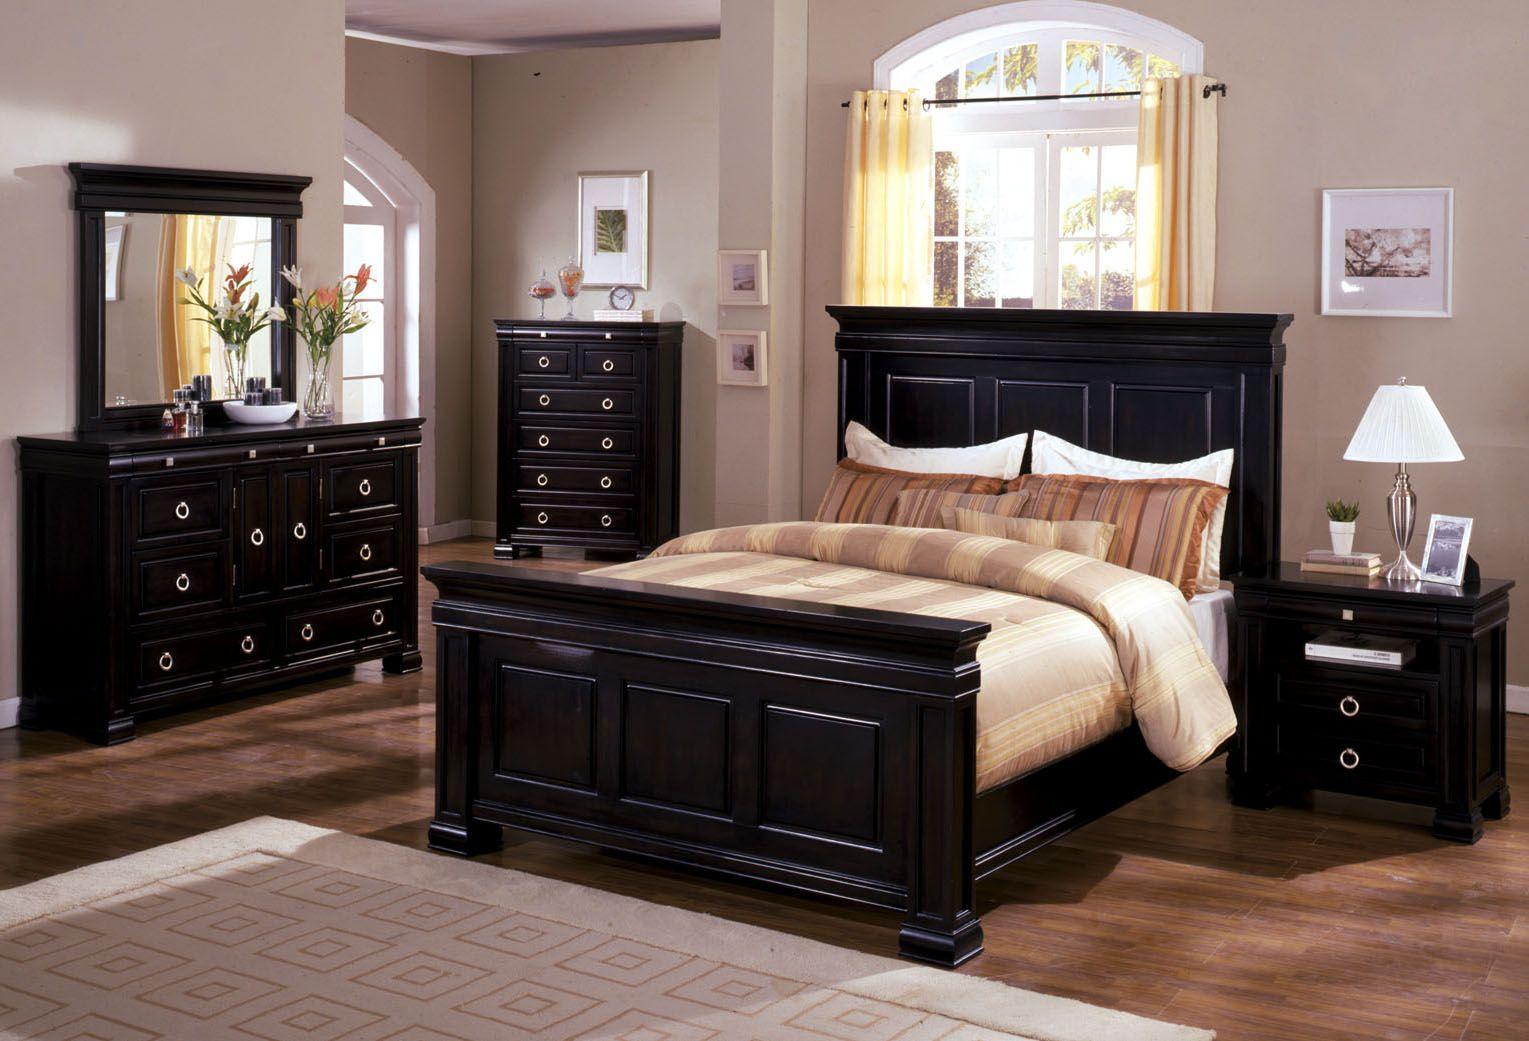 Does ikea have bedroom sets home decor pinterest ikea bedroom